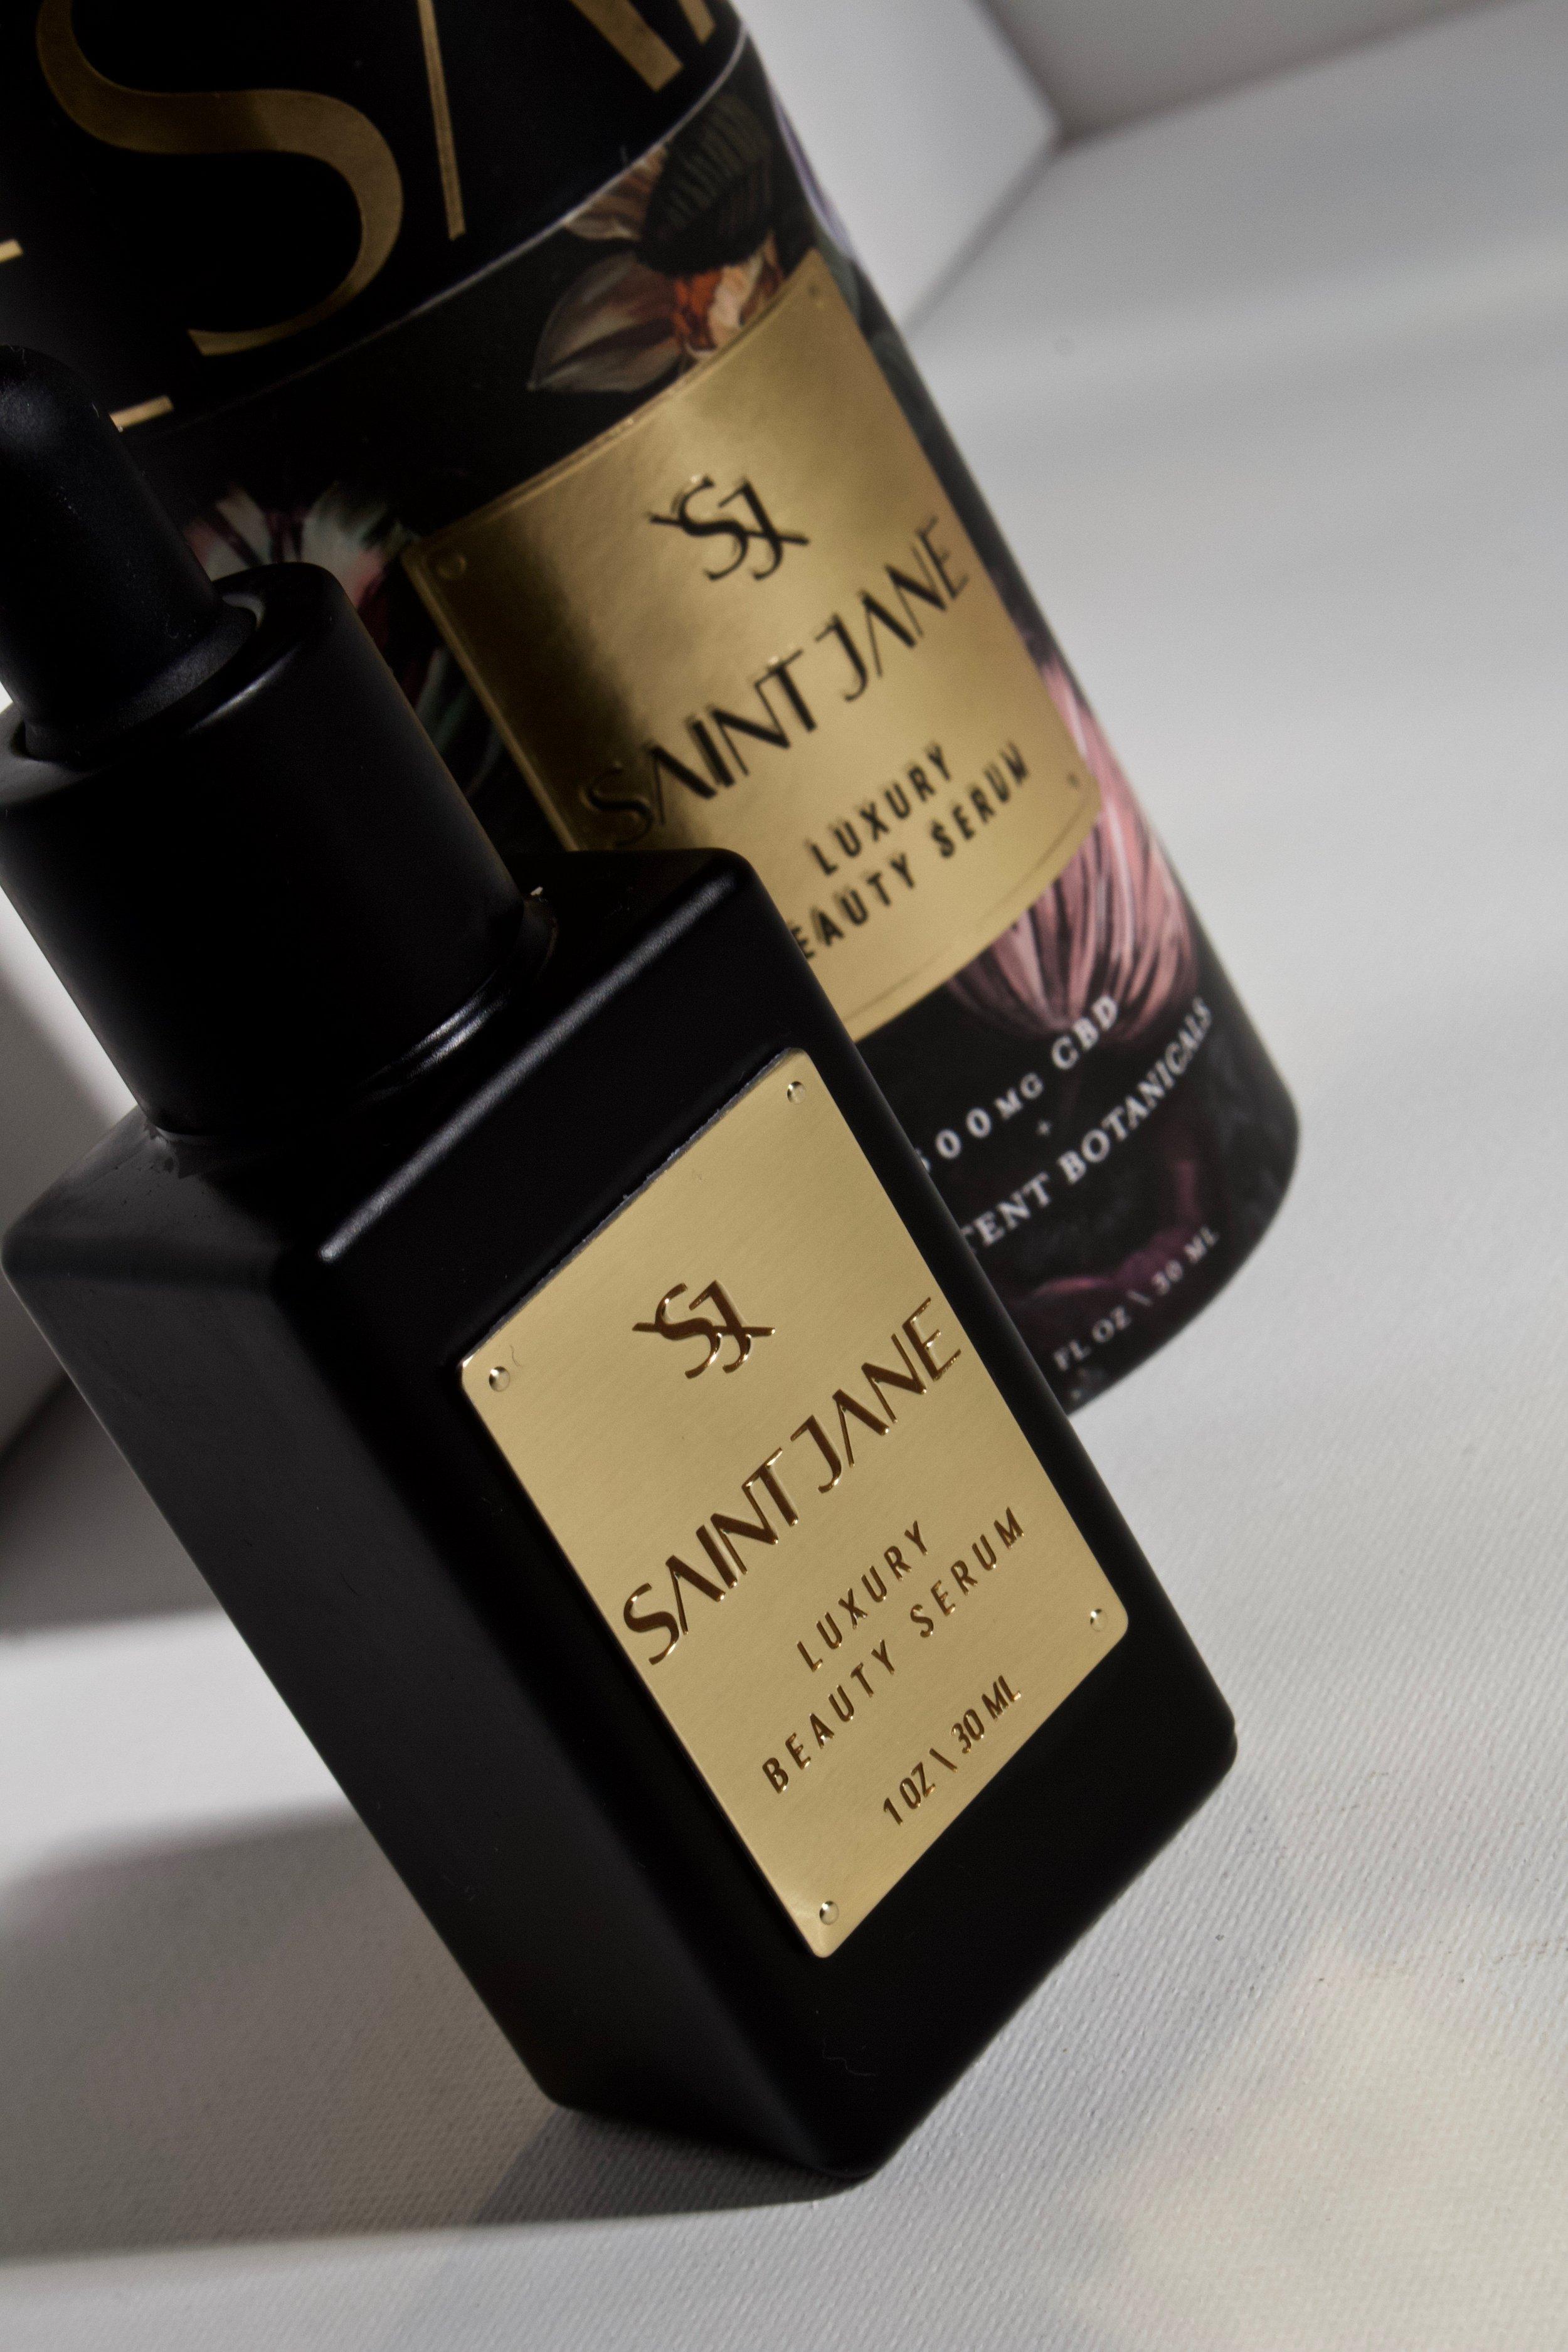 Saint Jane Beauty Serum Review